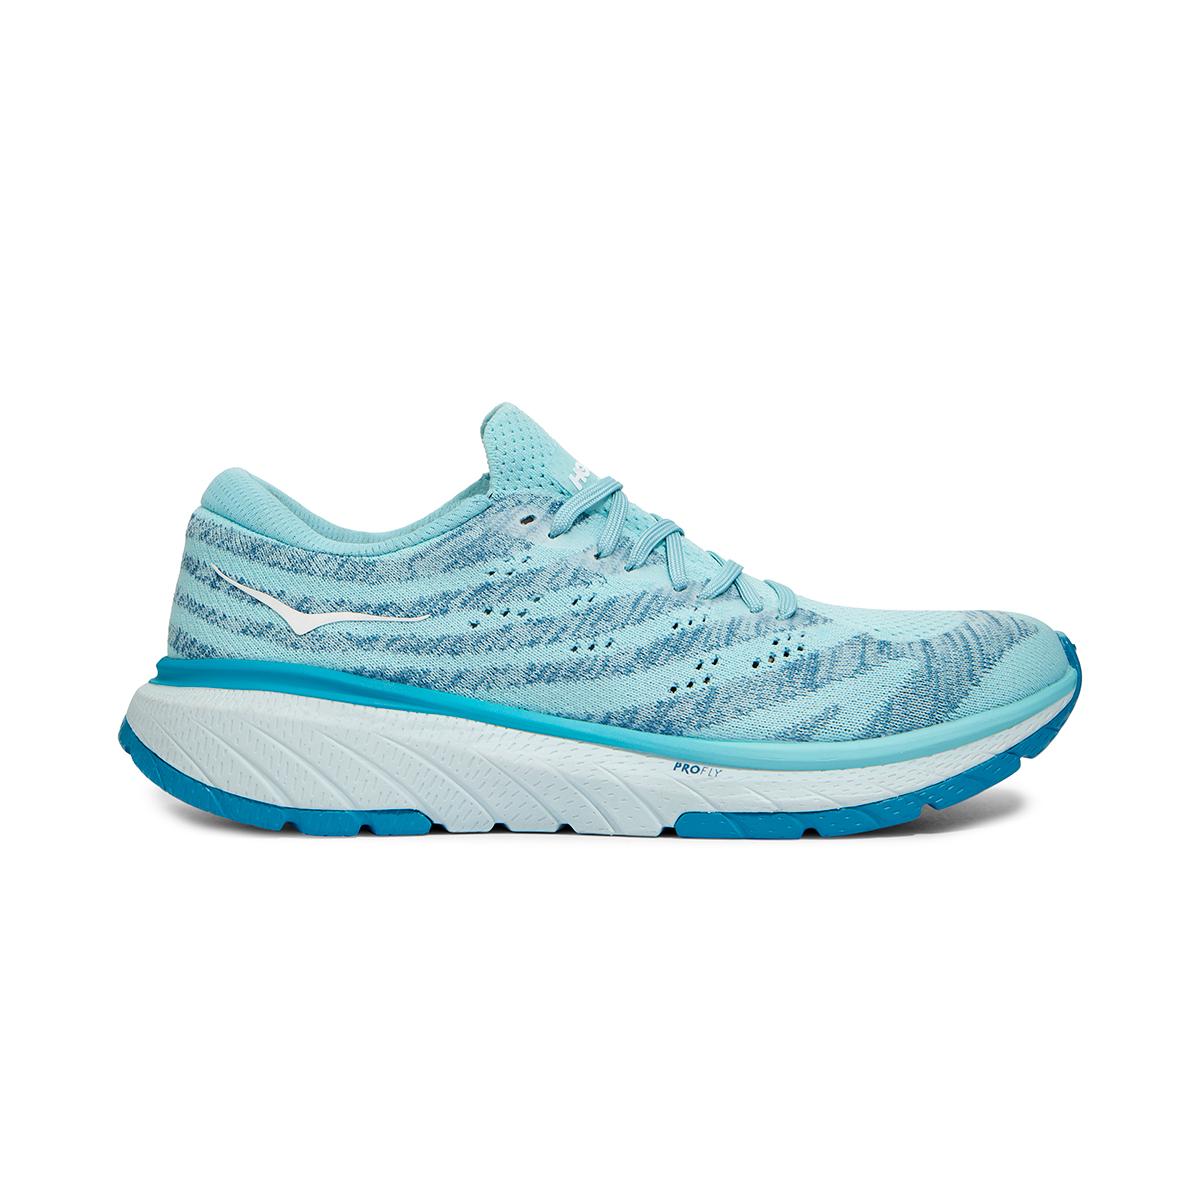 Women's Hoka One One Cavu 3 Running Shoe - Color: Stellar  - Size: 5 - Width: Regular, Stellar, large, image 1